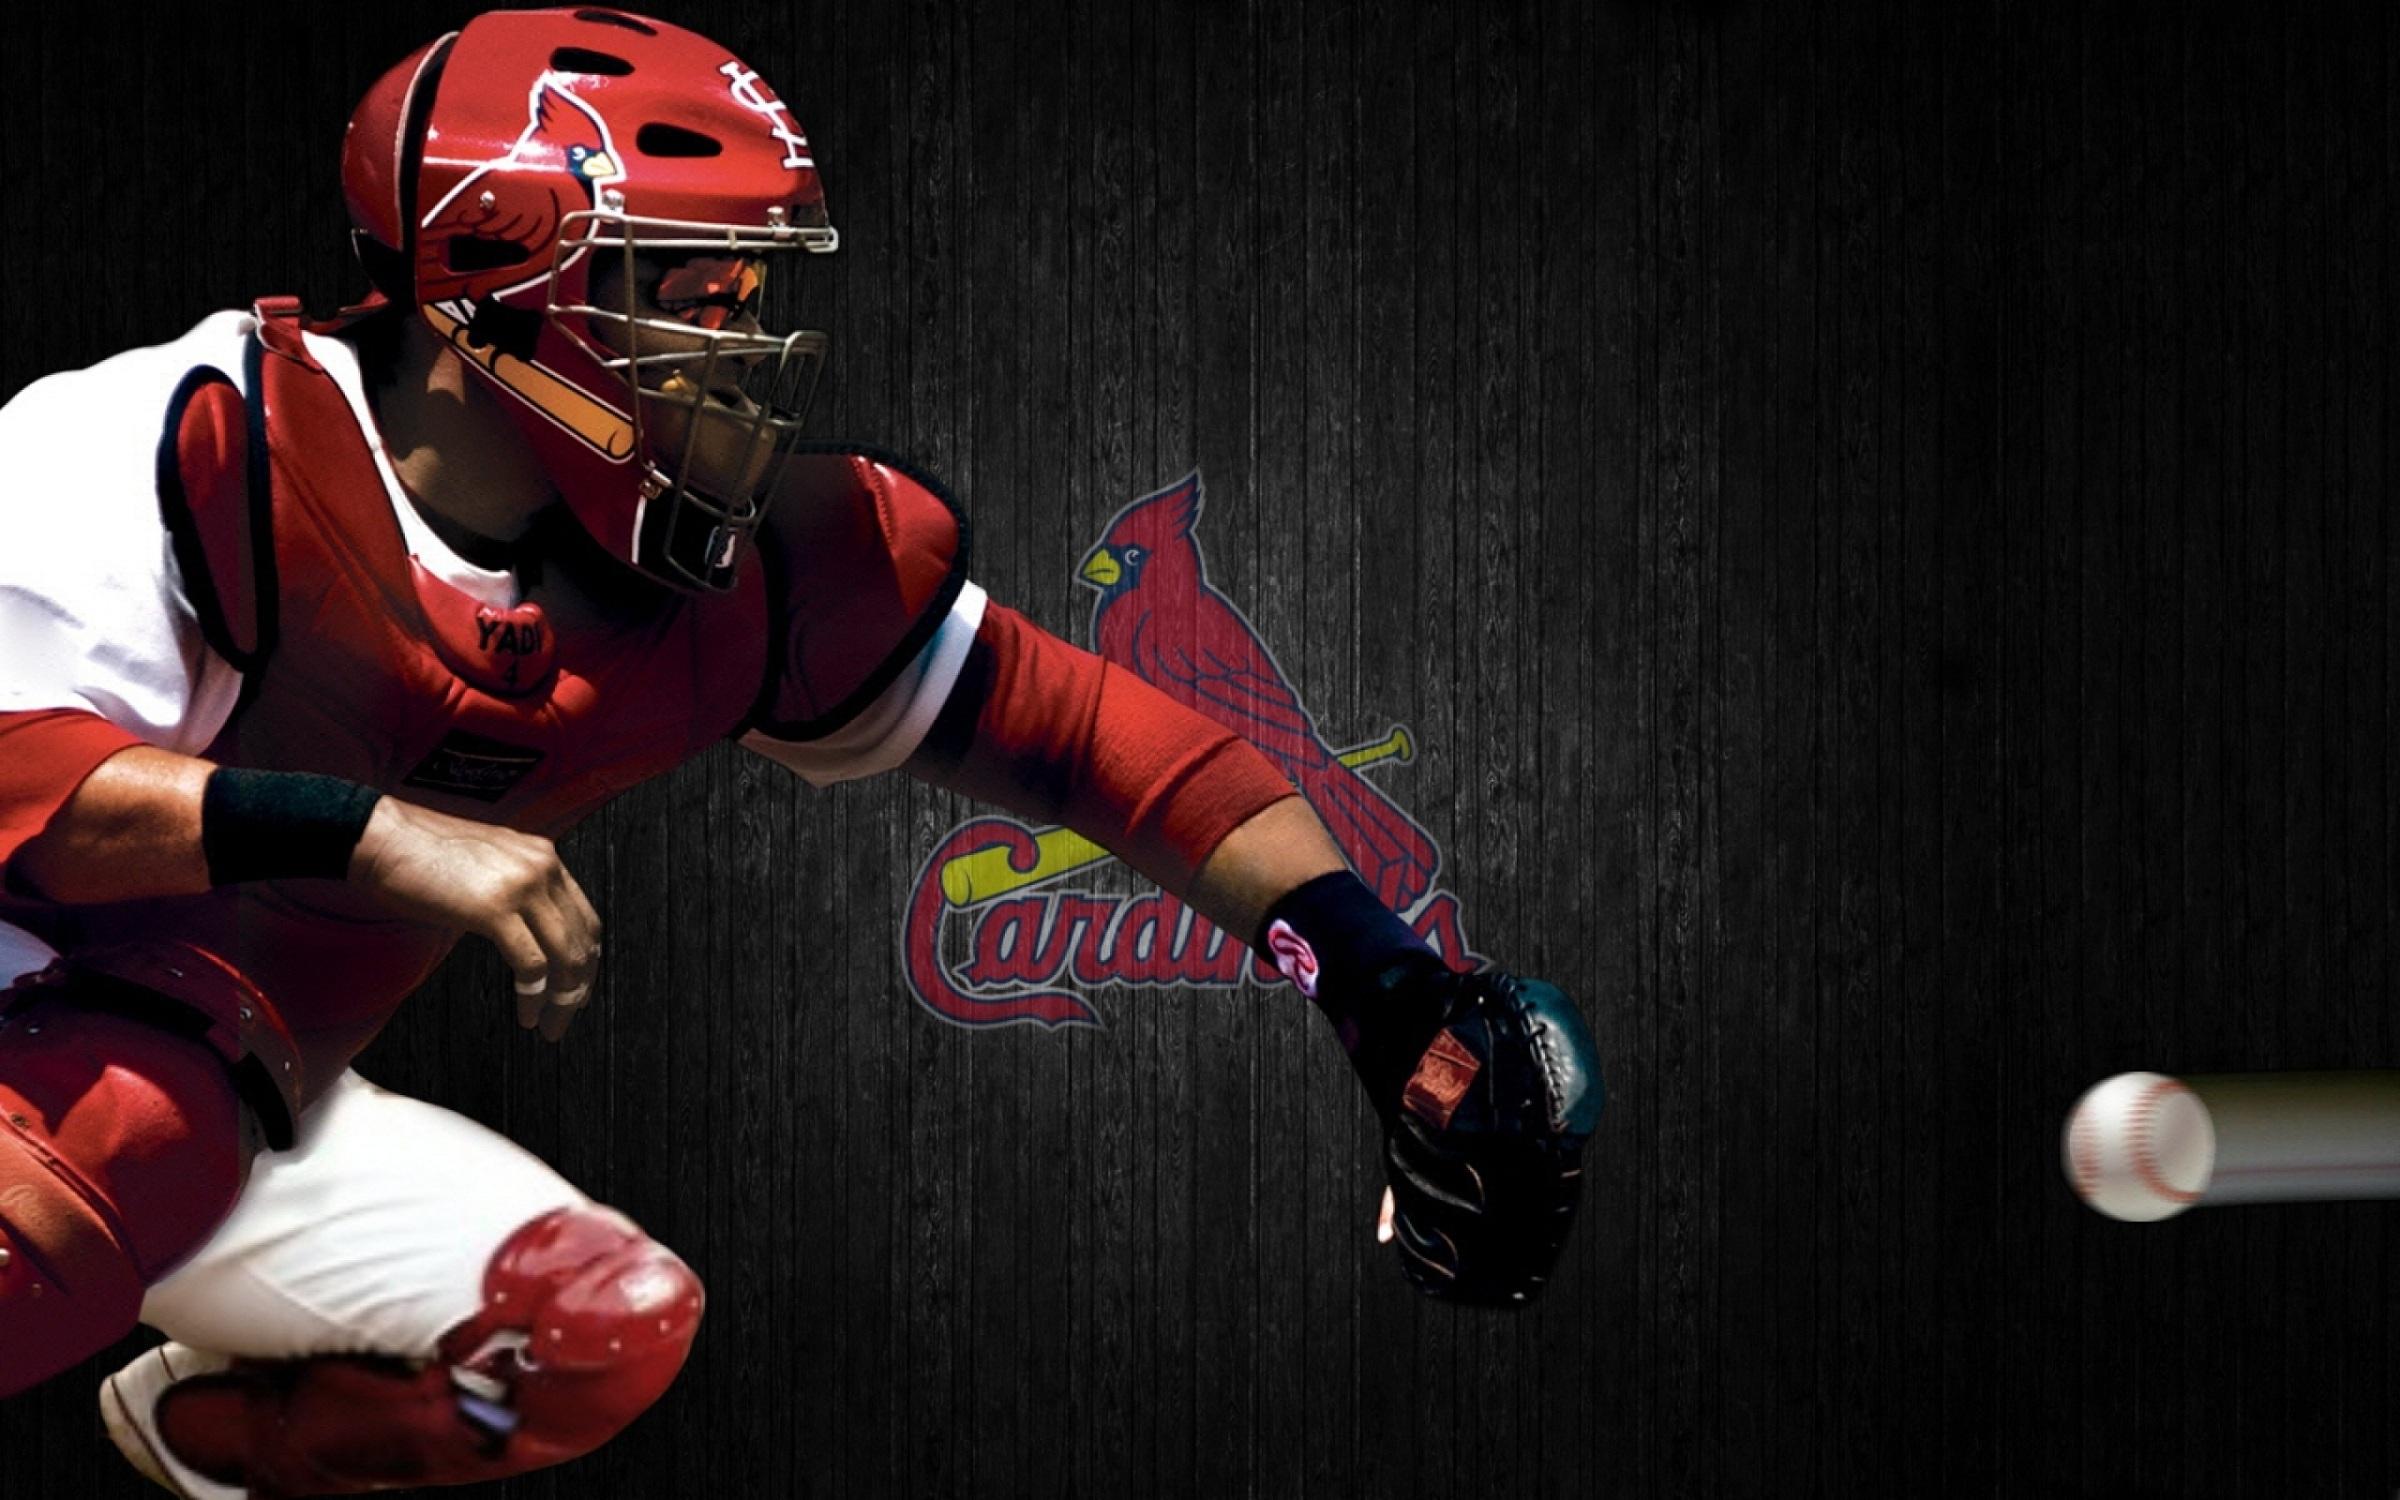 Free baseball screensavers and wallpaper full hdq baseball 2400x1500 voltagebd Image collections